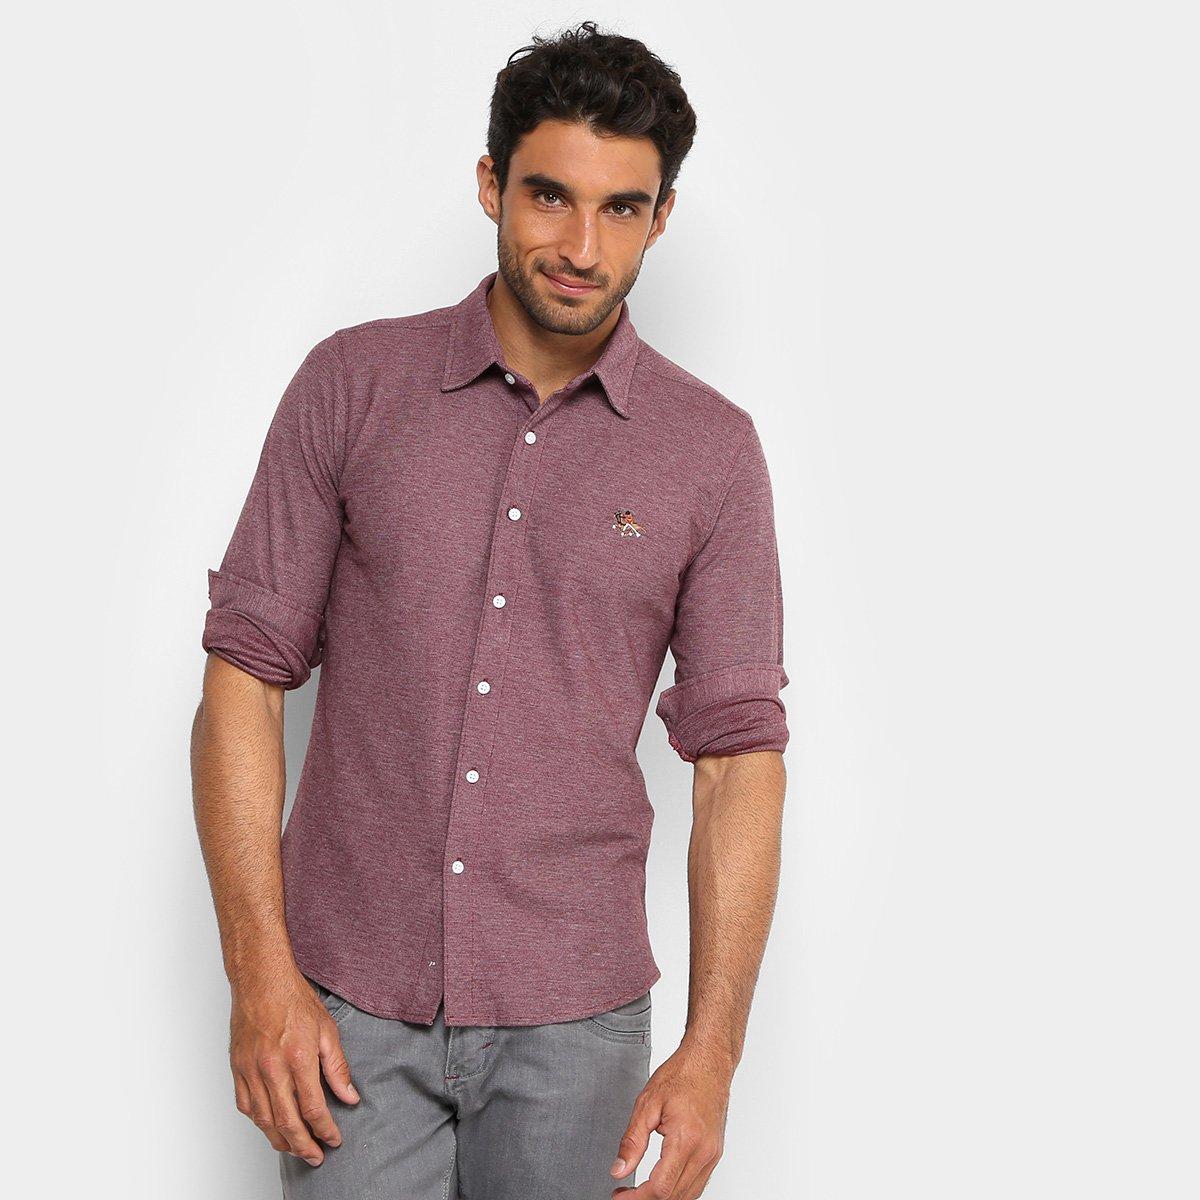 a6f52450fe Camisa RG 518 Bordado Malha Masculina